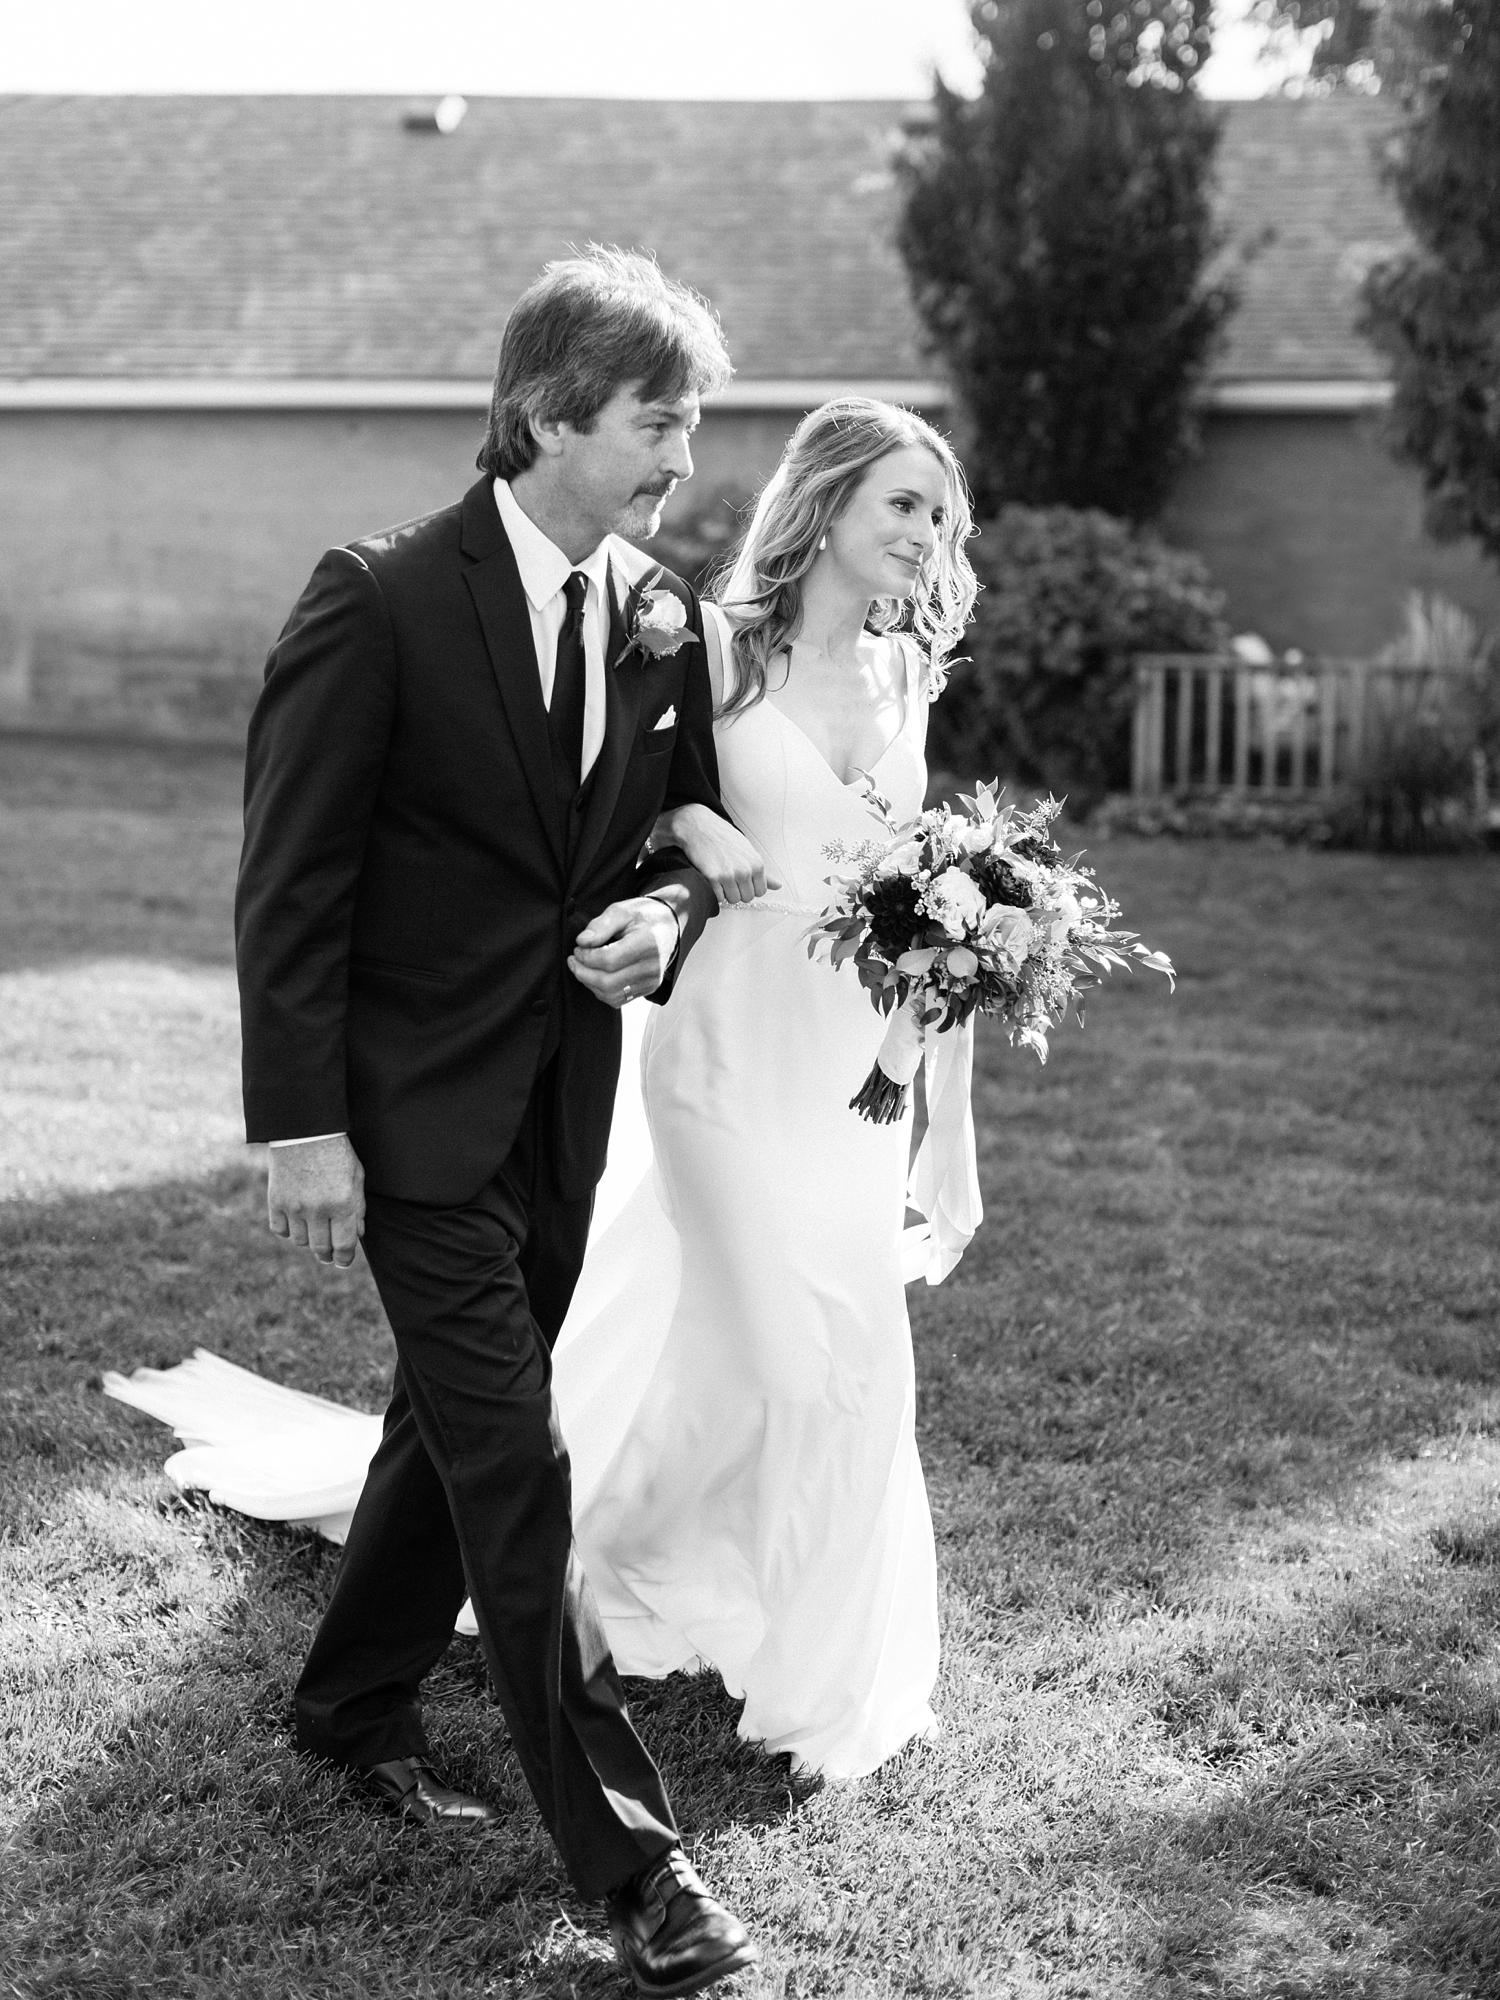 Brittany Williams Photography Wedding_0009.jpg